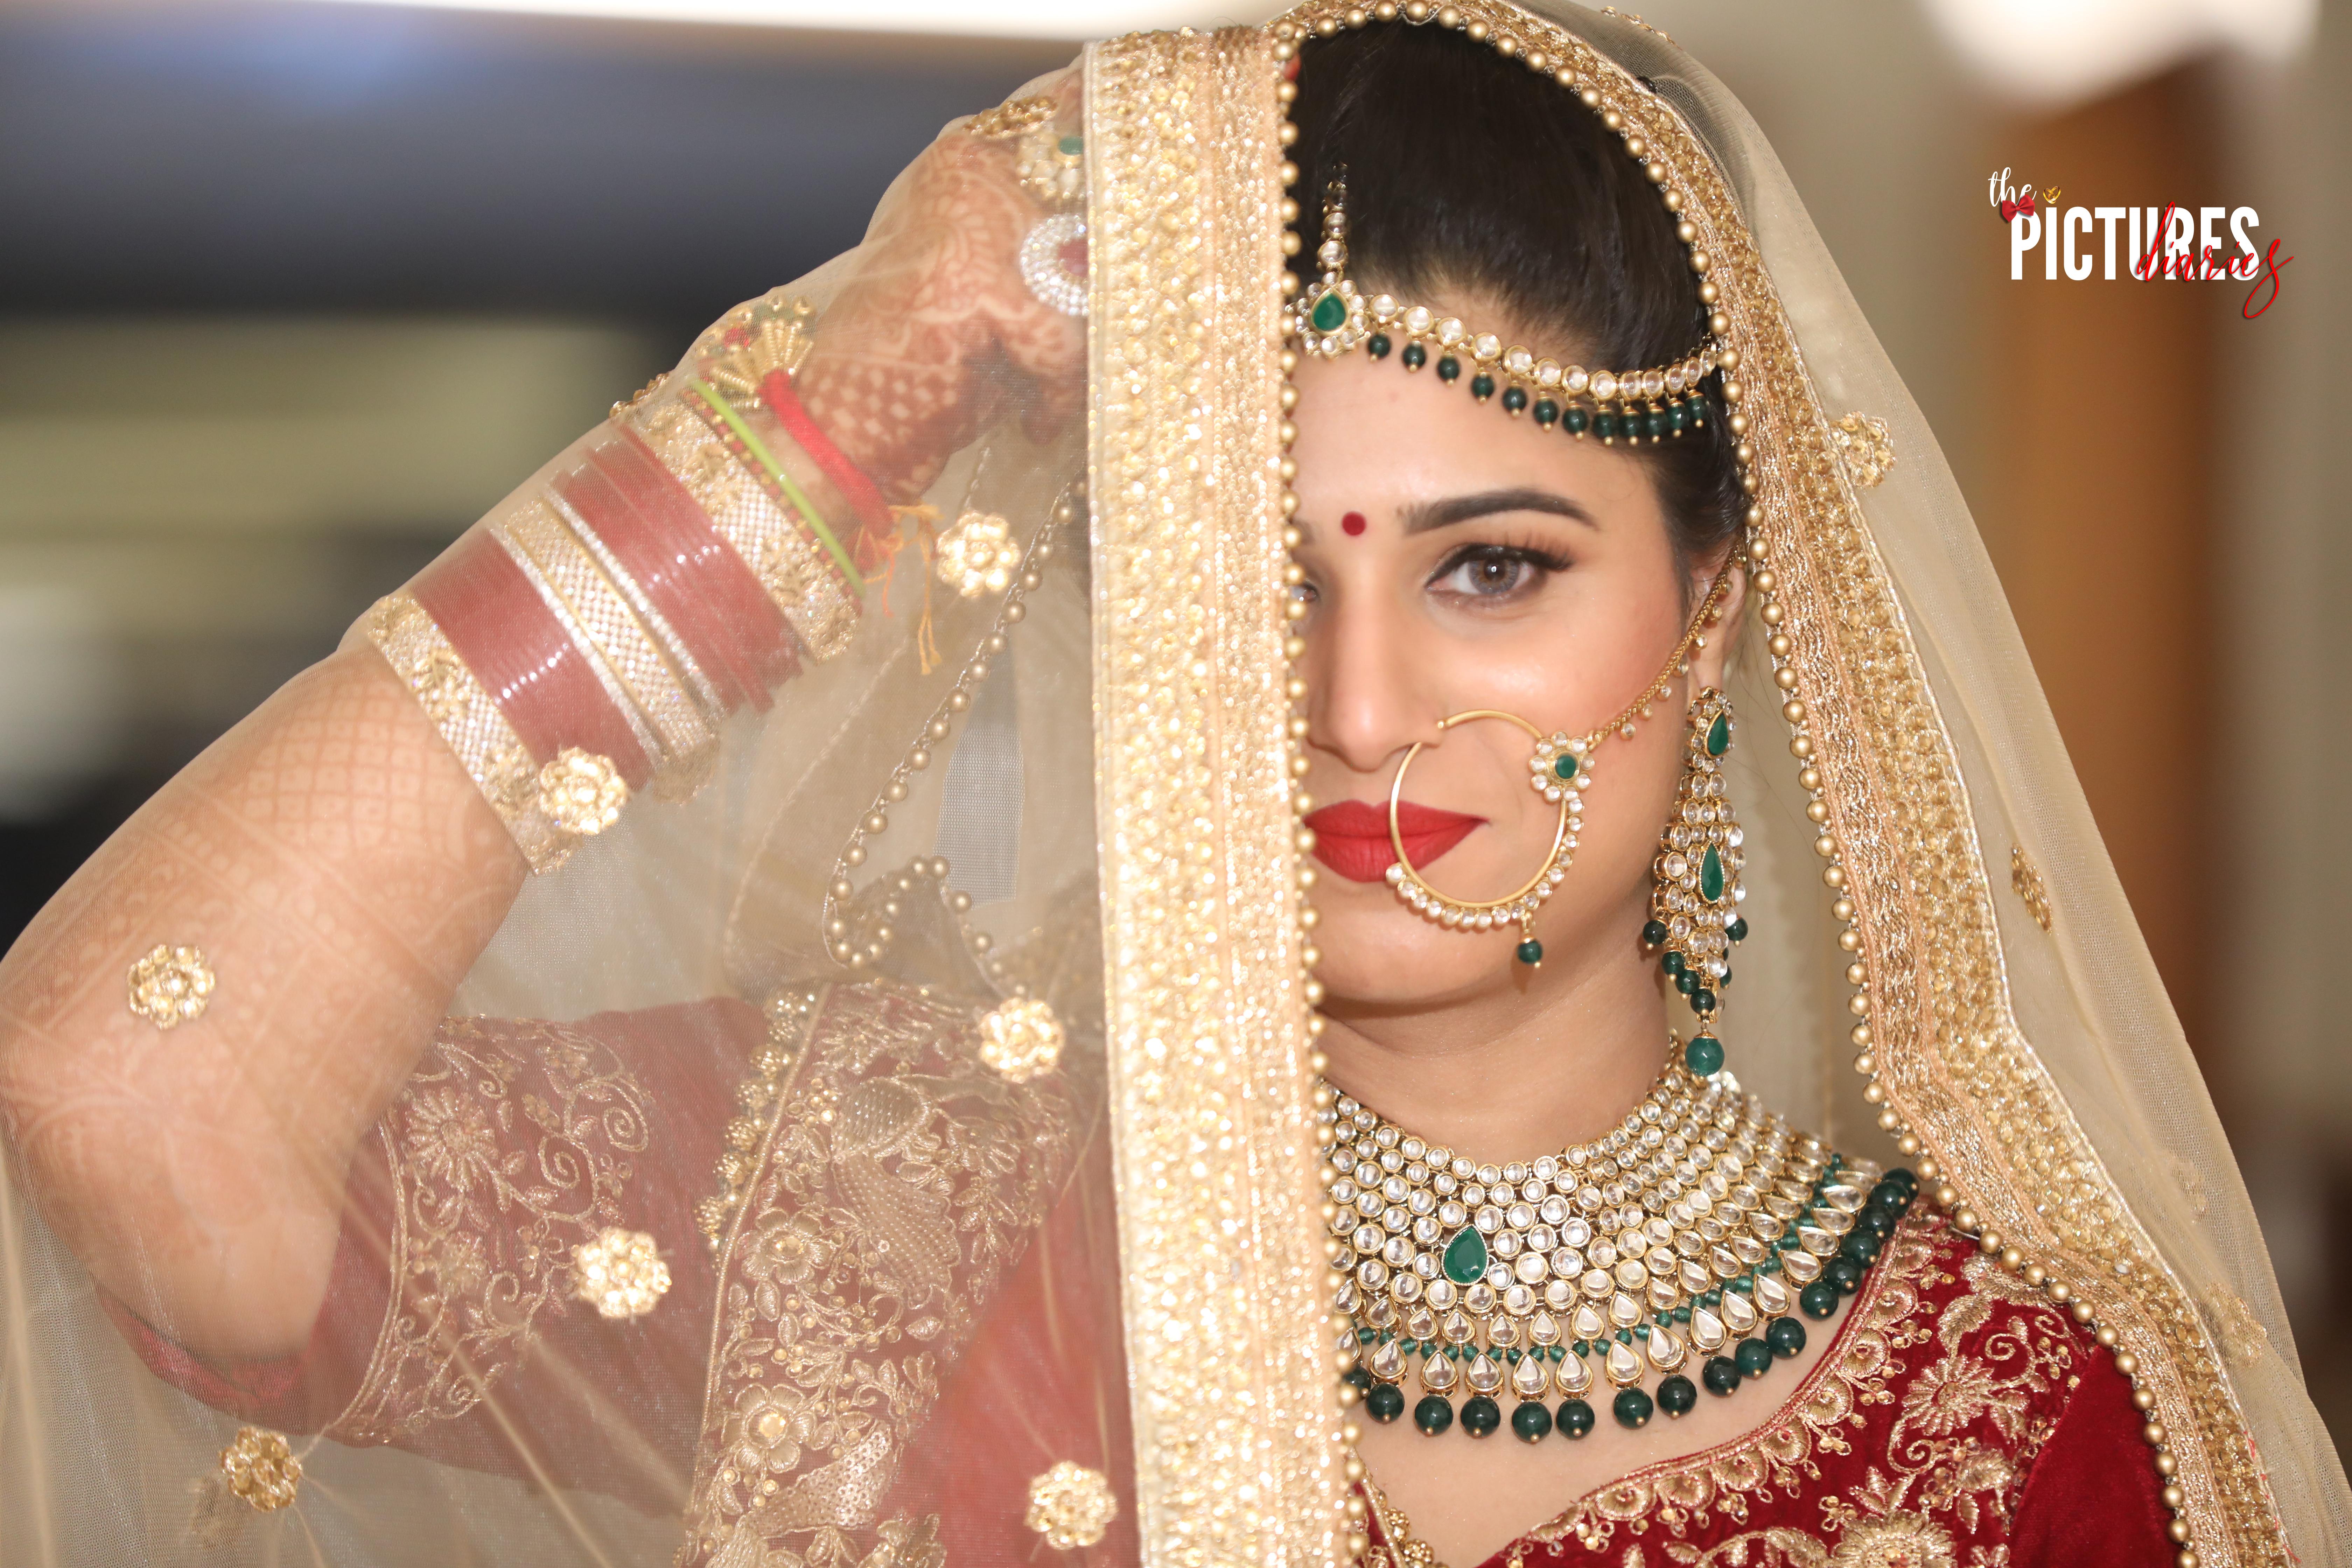 Stunning Indian Bride in Veil